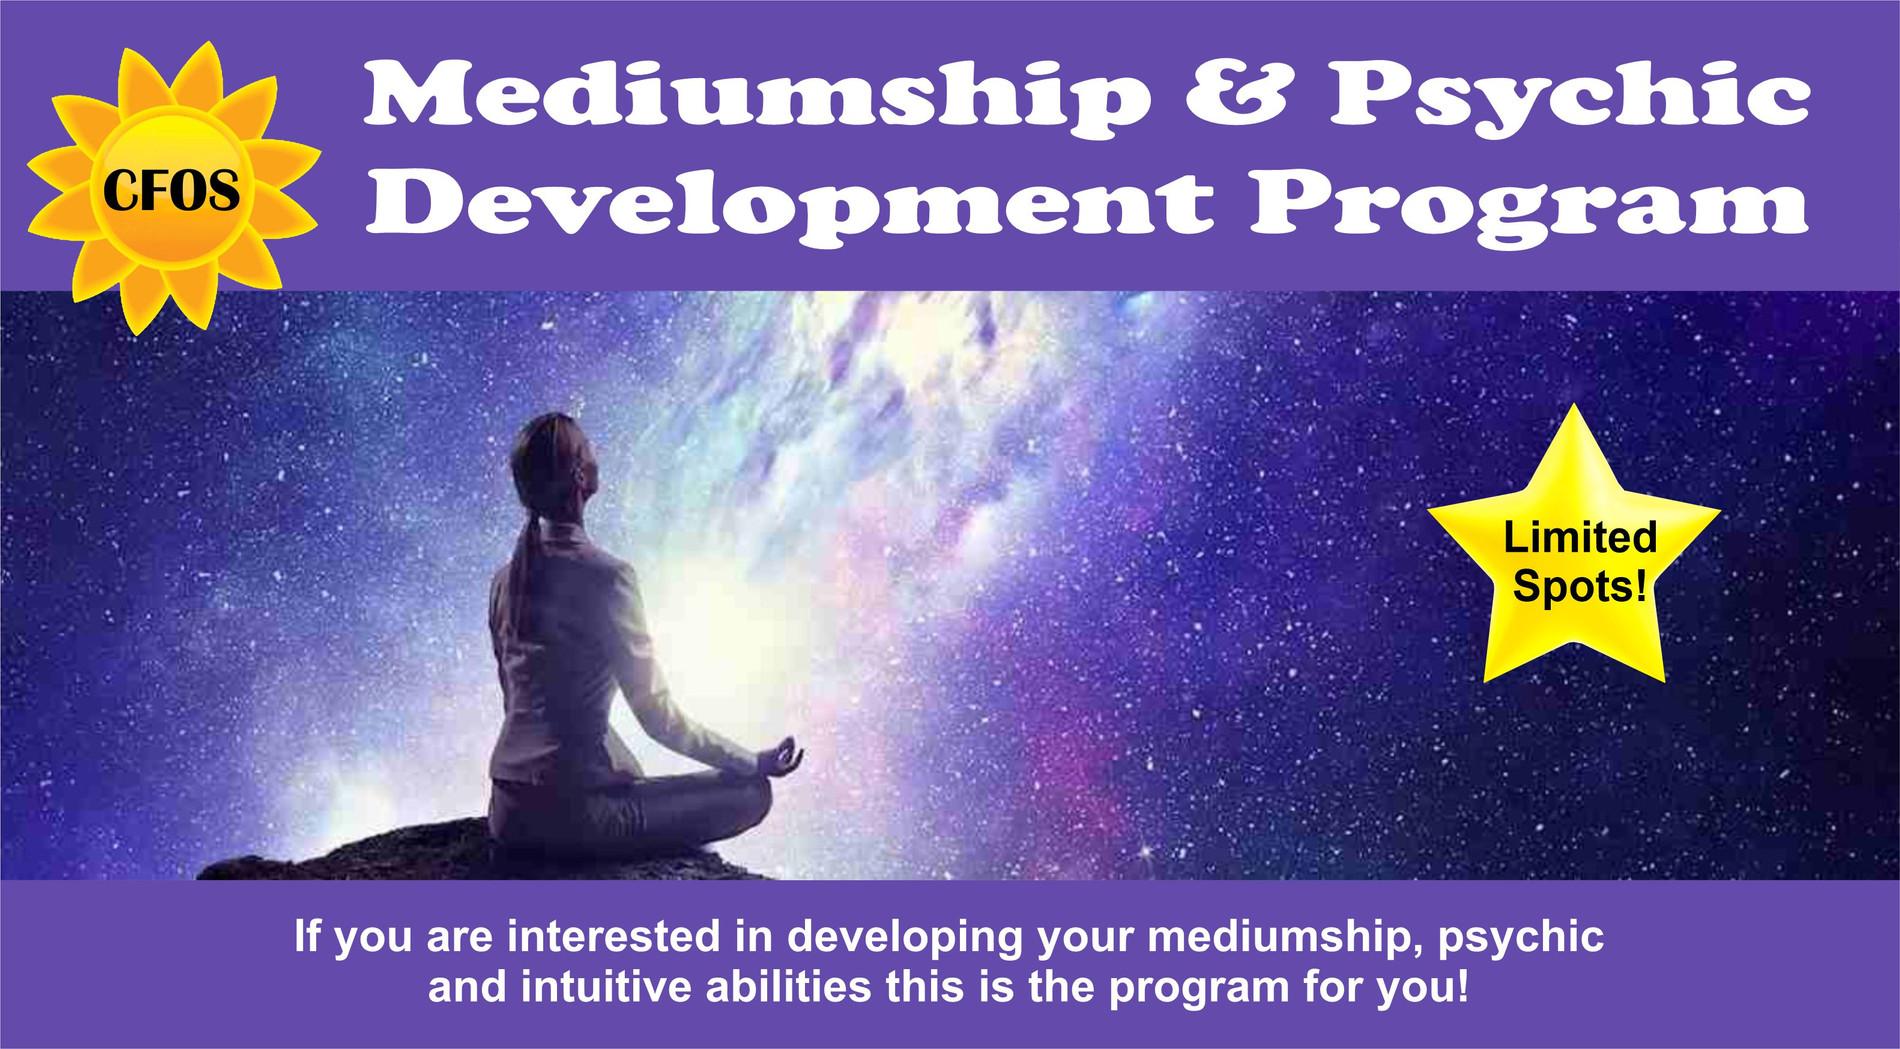 8-Week Development Program